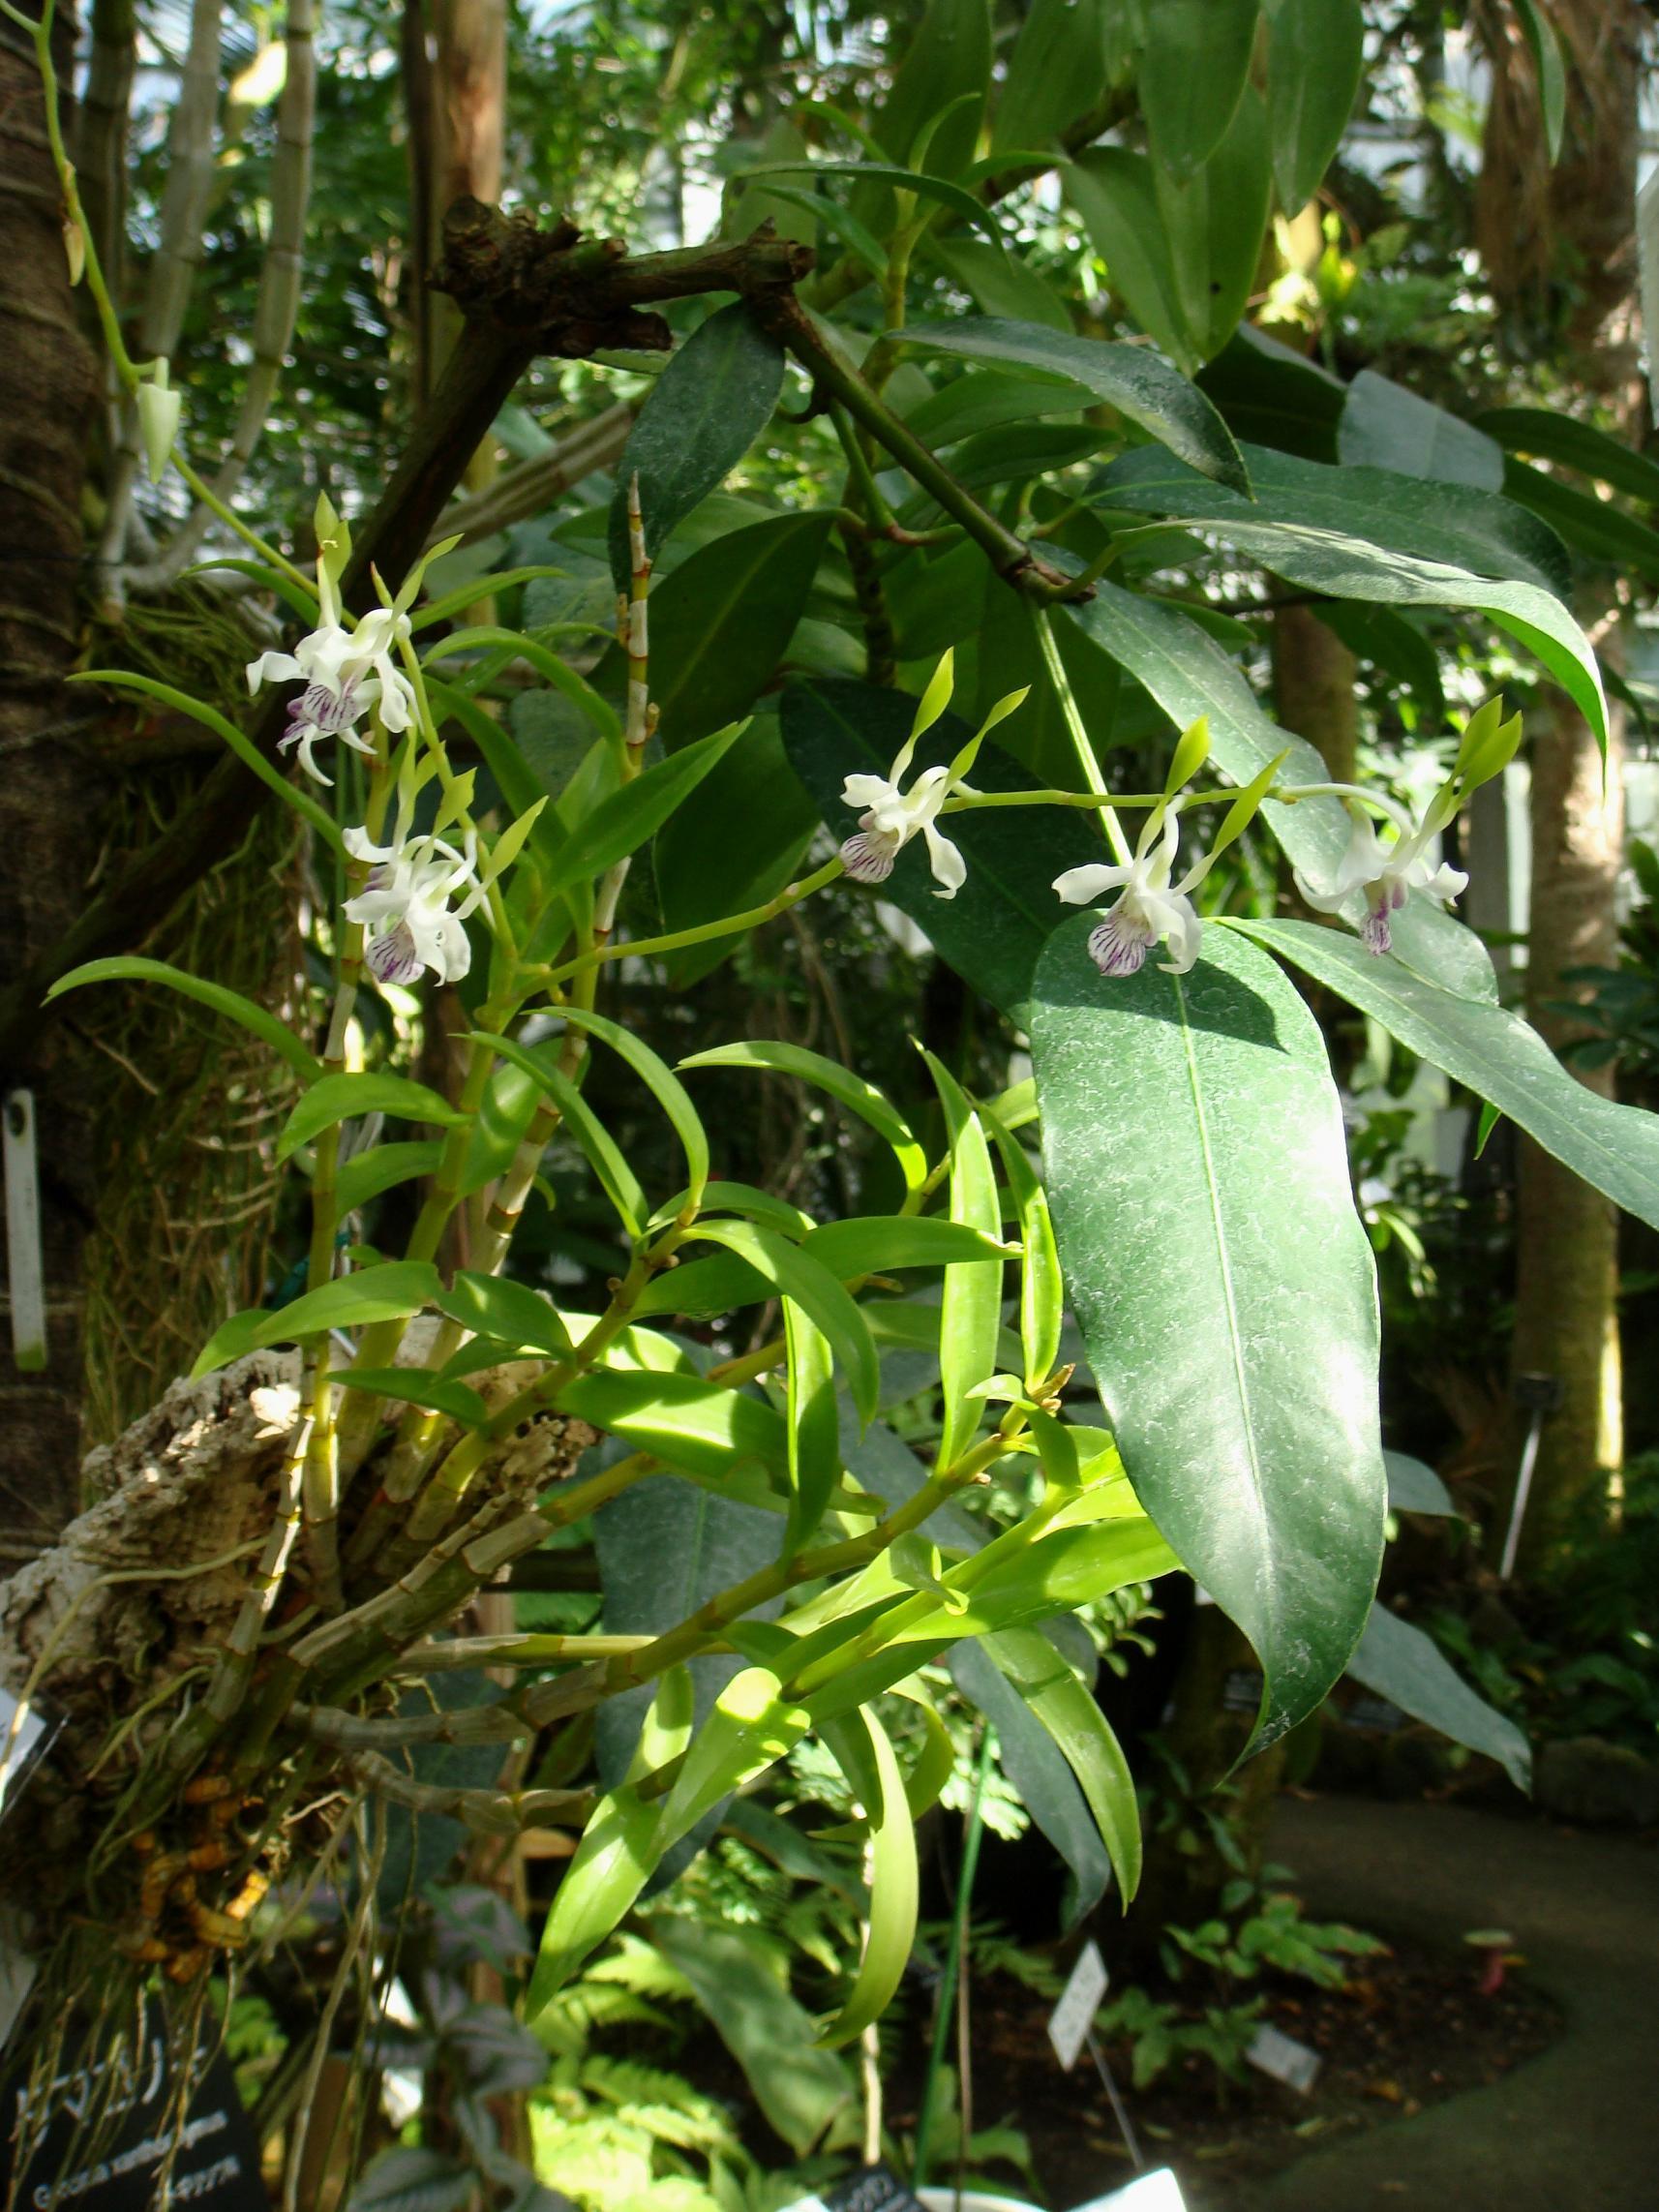 http://orchids.la.coocan.jp/Dendrobium/Dendrobium%20antennatum/DSC03018.JPG